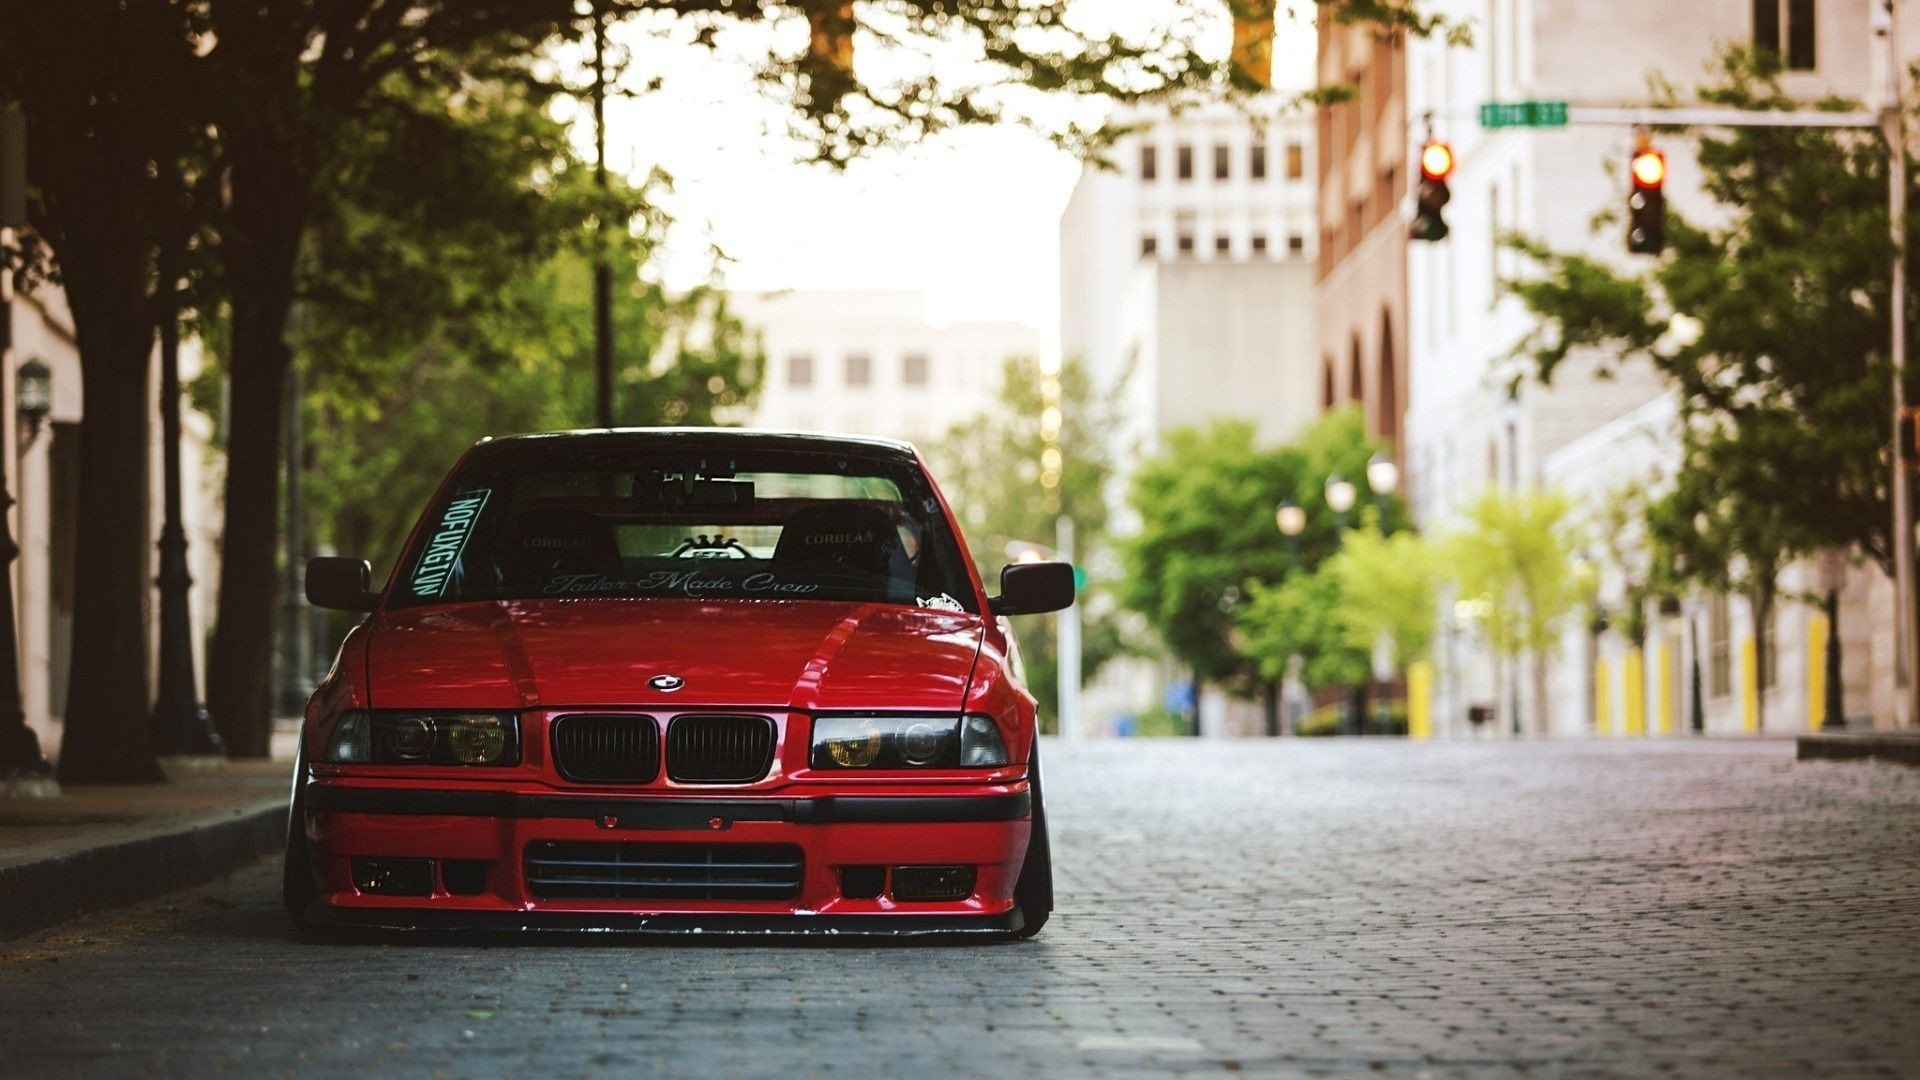 BMW E36 Wallpaper (61+ Images